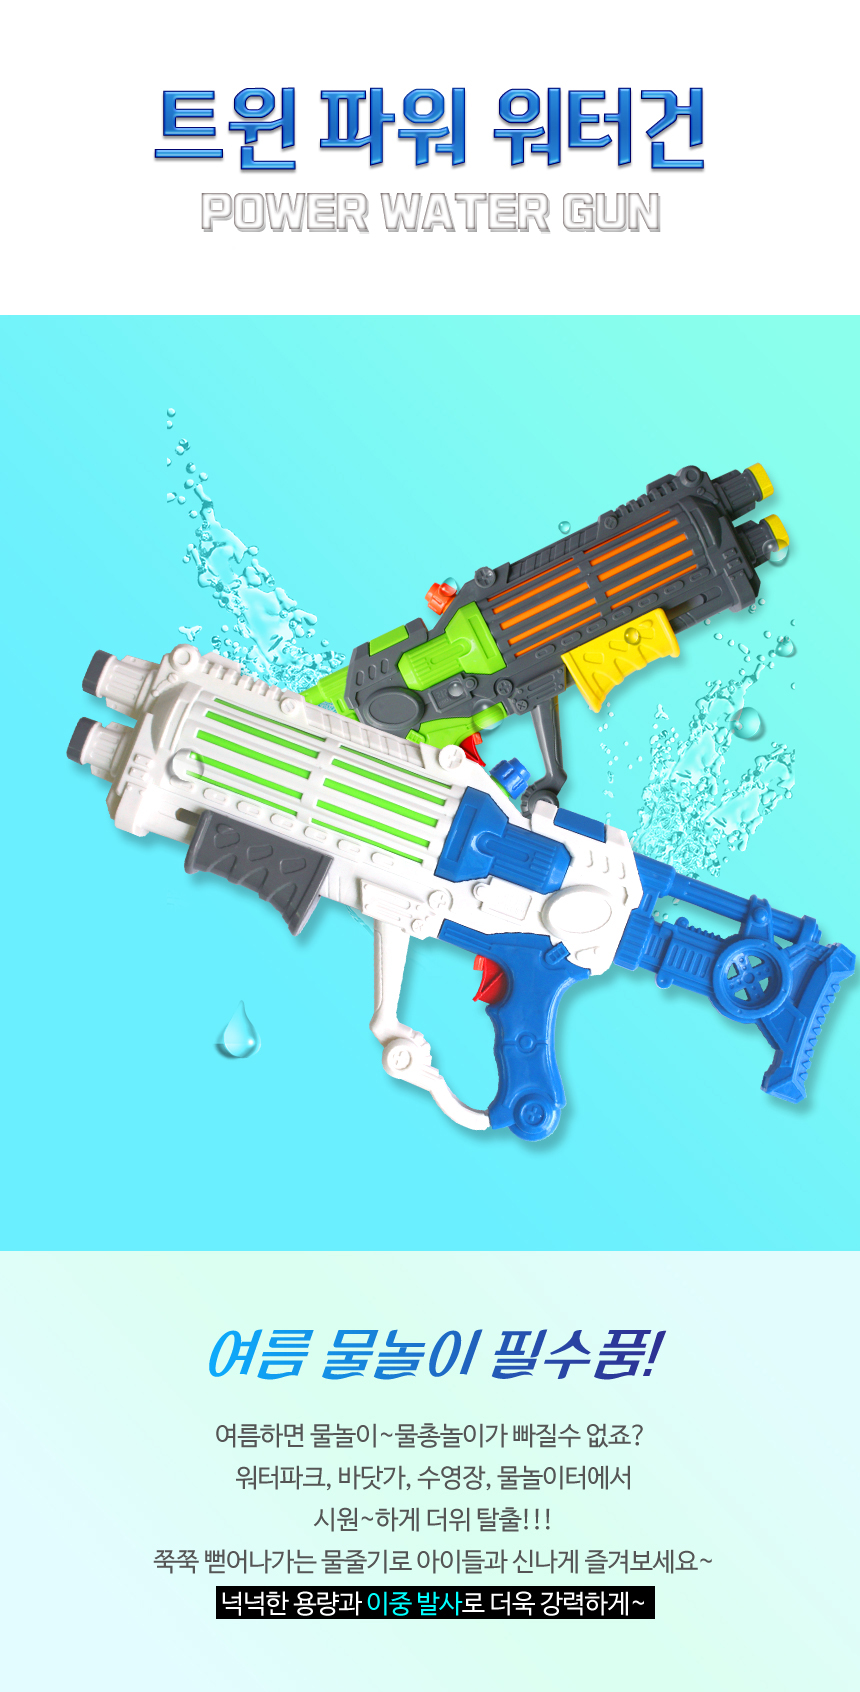 power_watergun_01.jpg